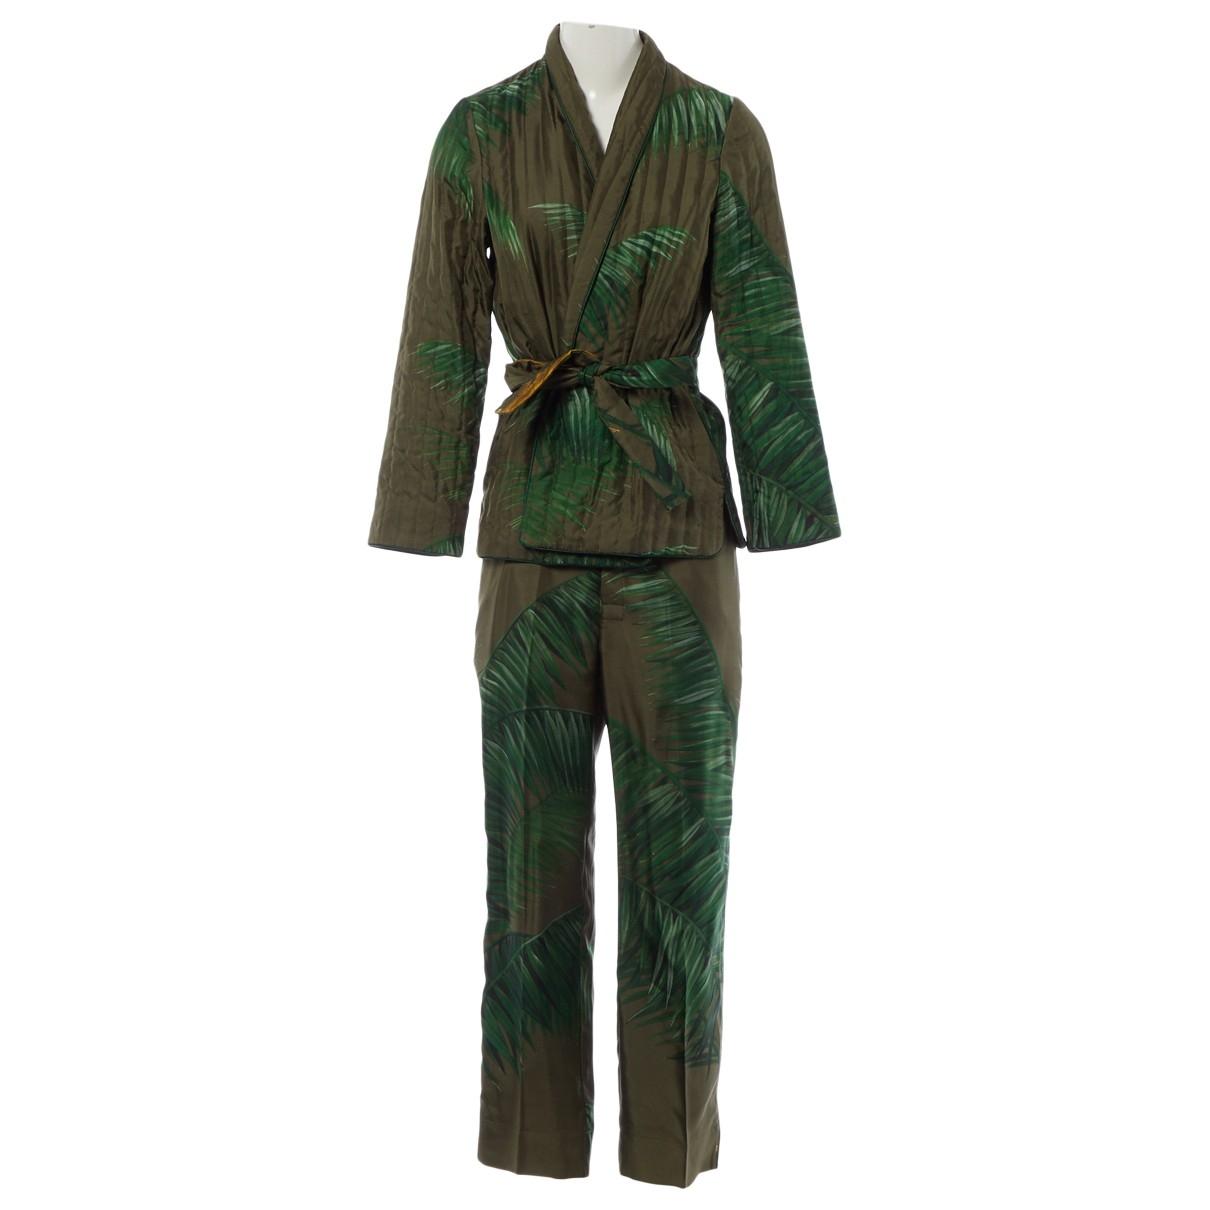 F.r.s For Restless Sleepers \N Green Silk jacket for Women M International